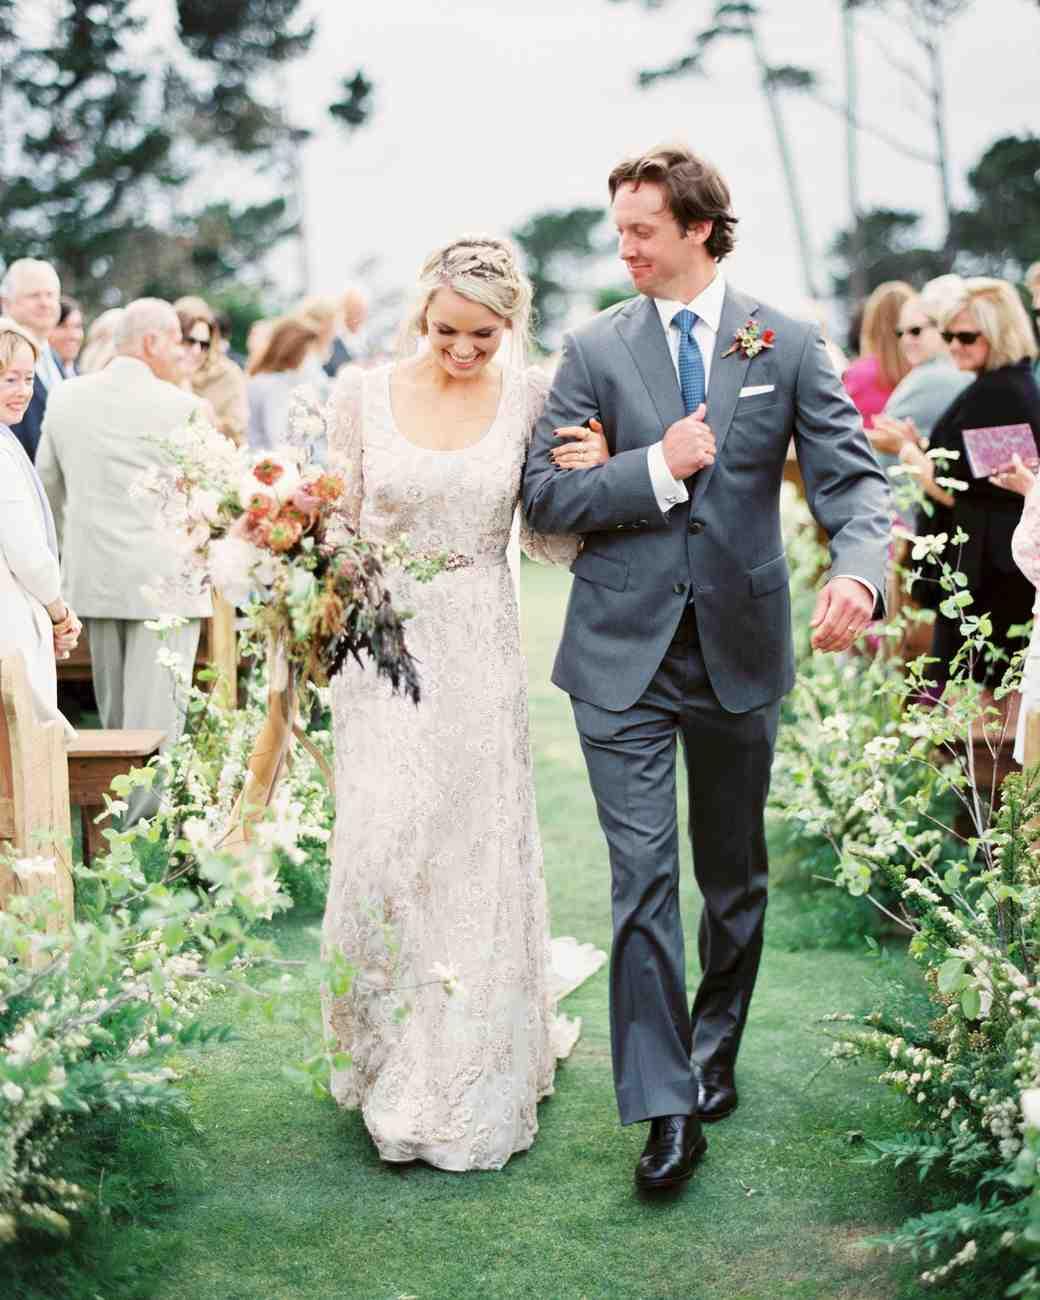 ginny-andrew-wedding-ceremony-0636-s112676-0216.jpg